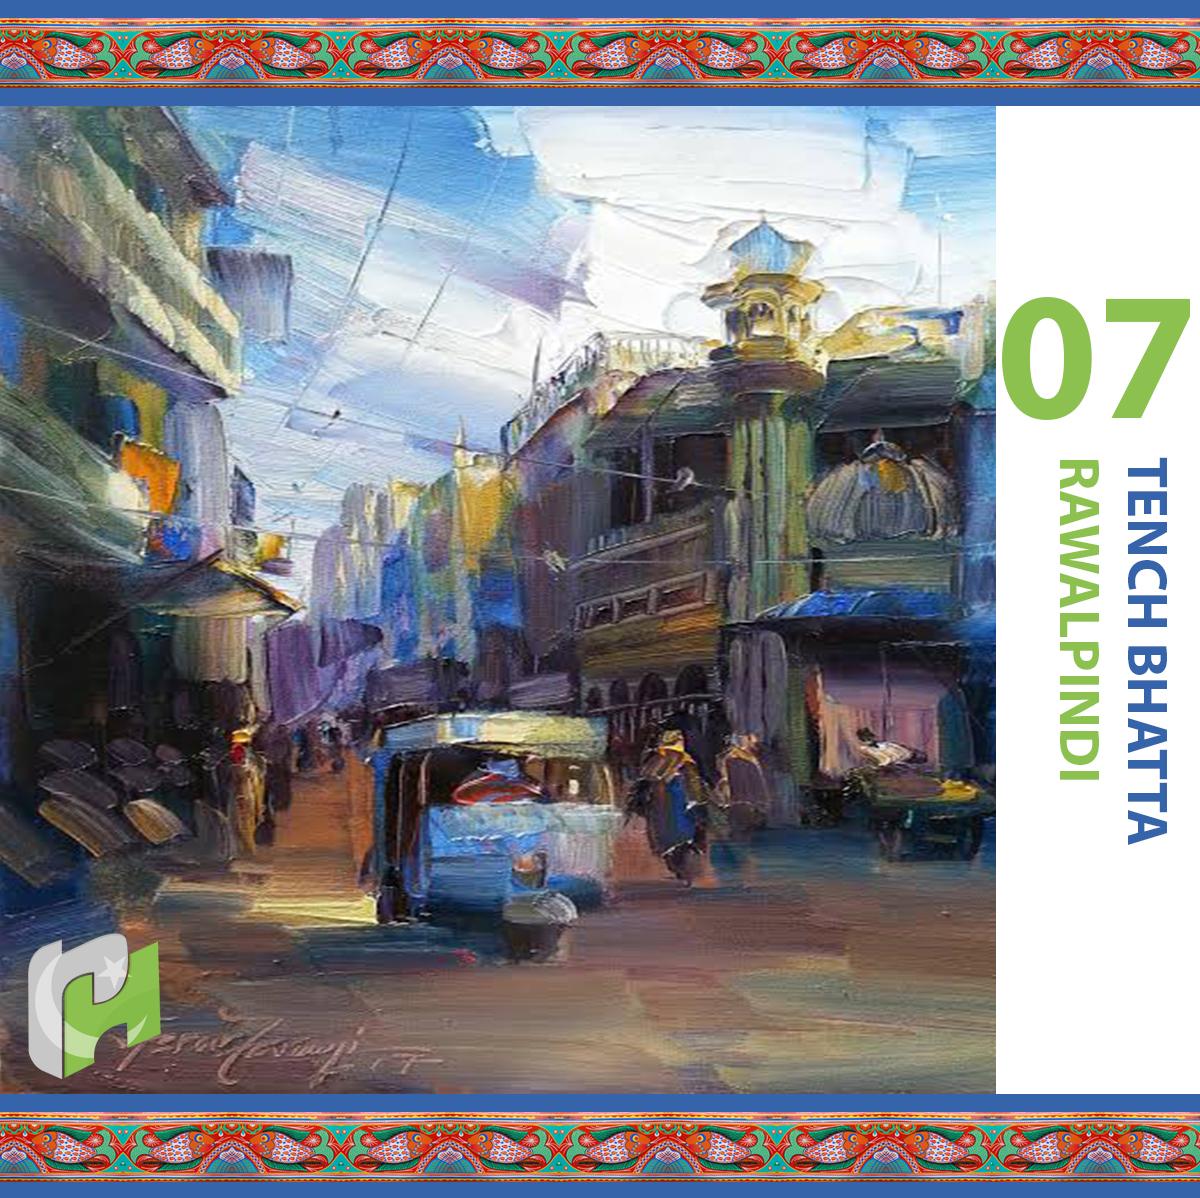 Raja Bazar Rawalpindi: Top 10 Bazaars And Traditional Markets In Pakistan For